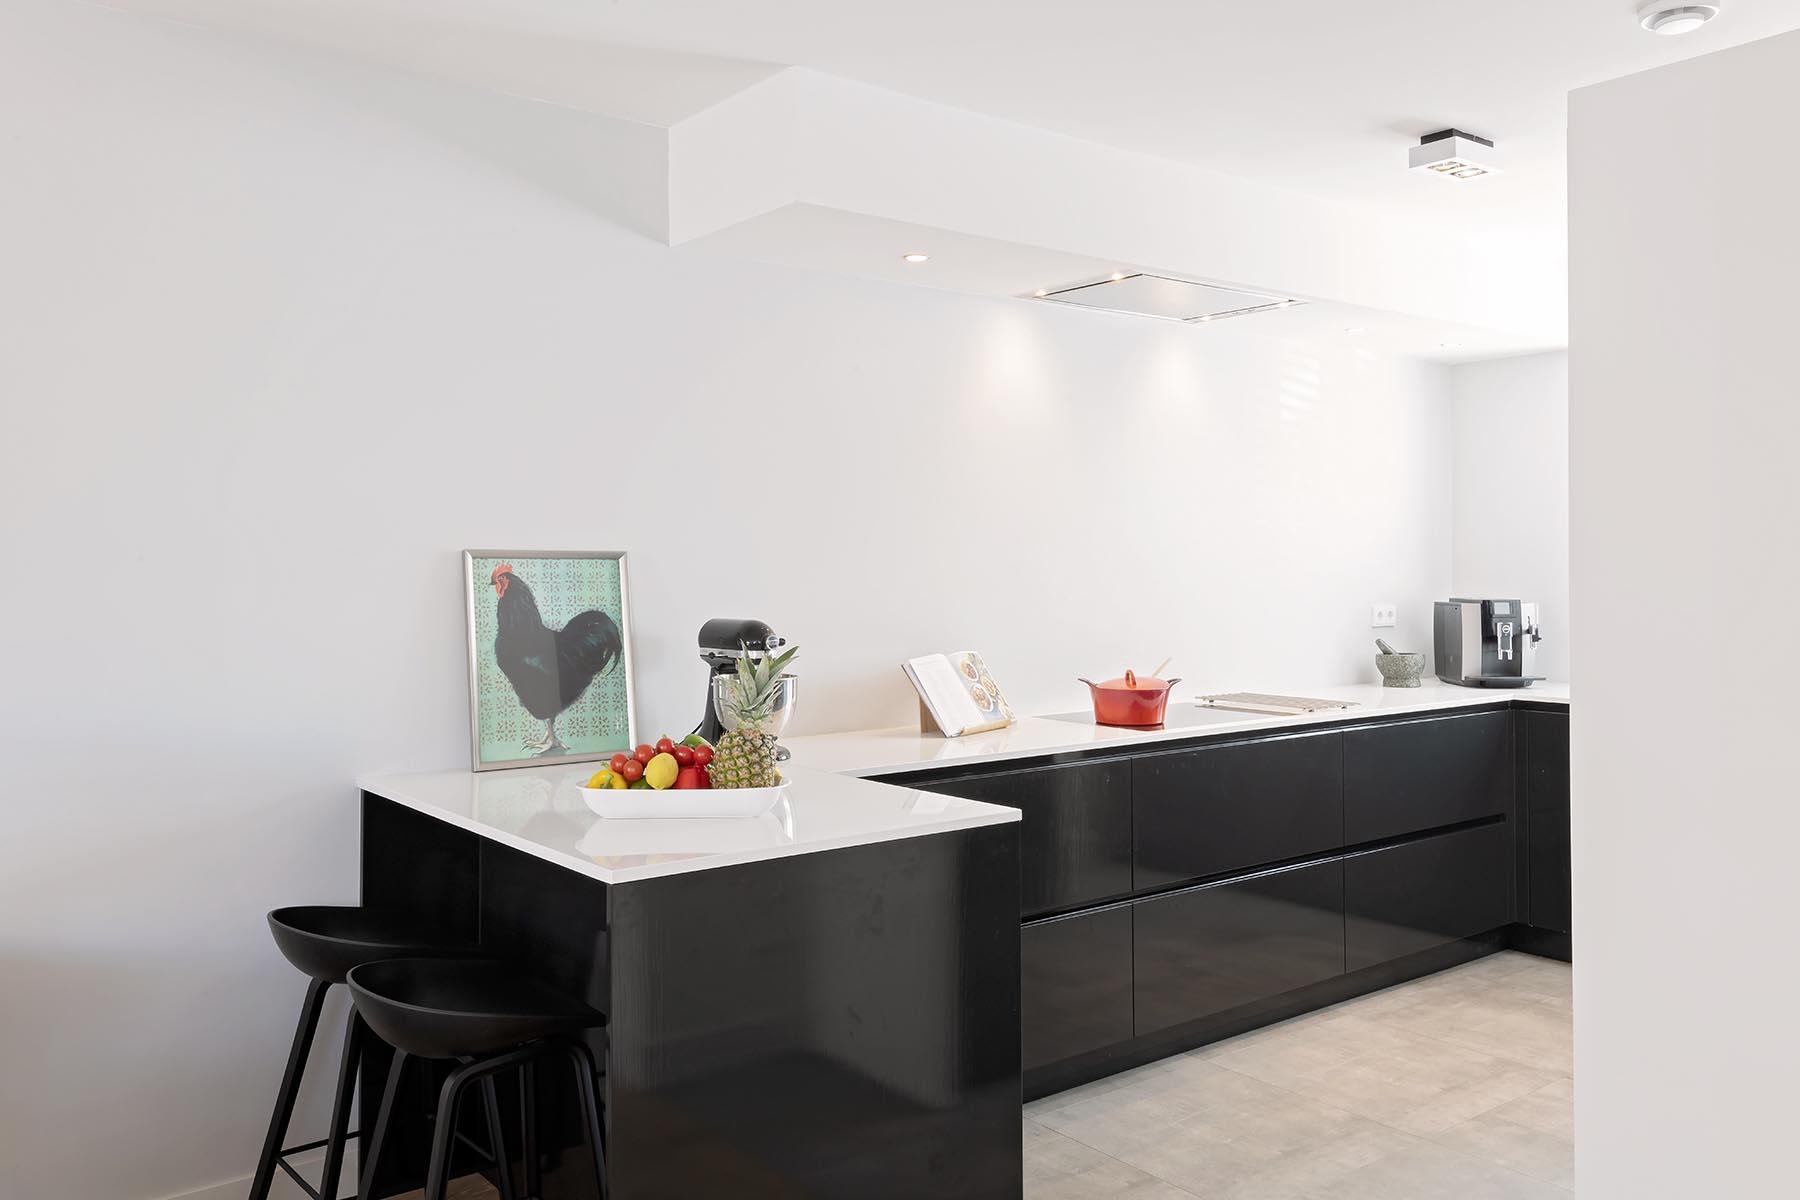 Maatwerk keuken in Haarlem